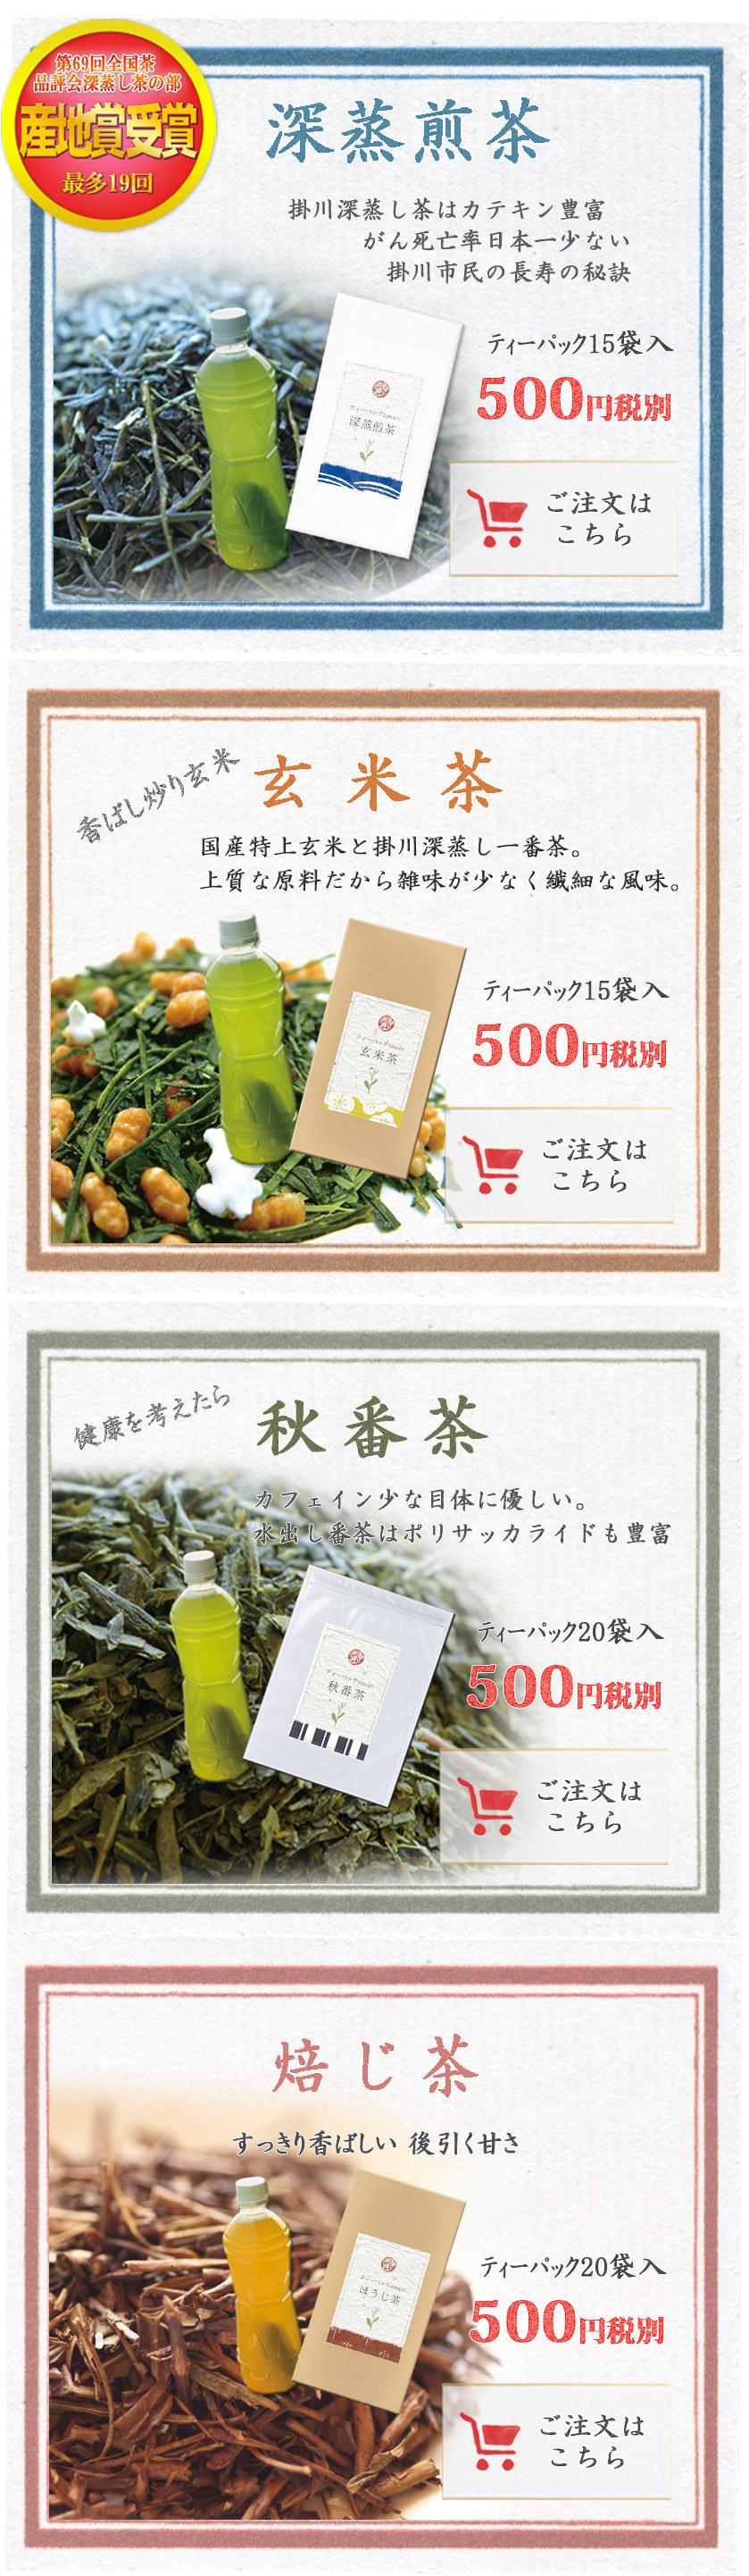 Gold angeltsuna kimura 4 by packmans 4